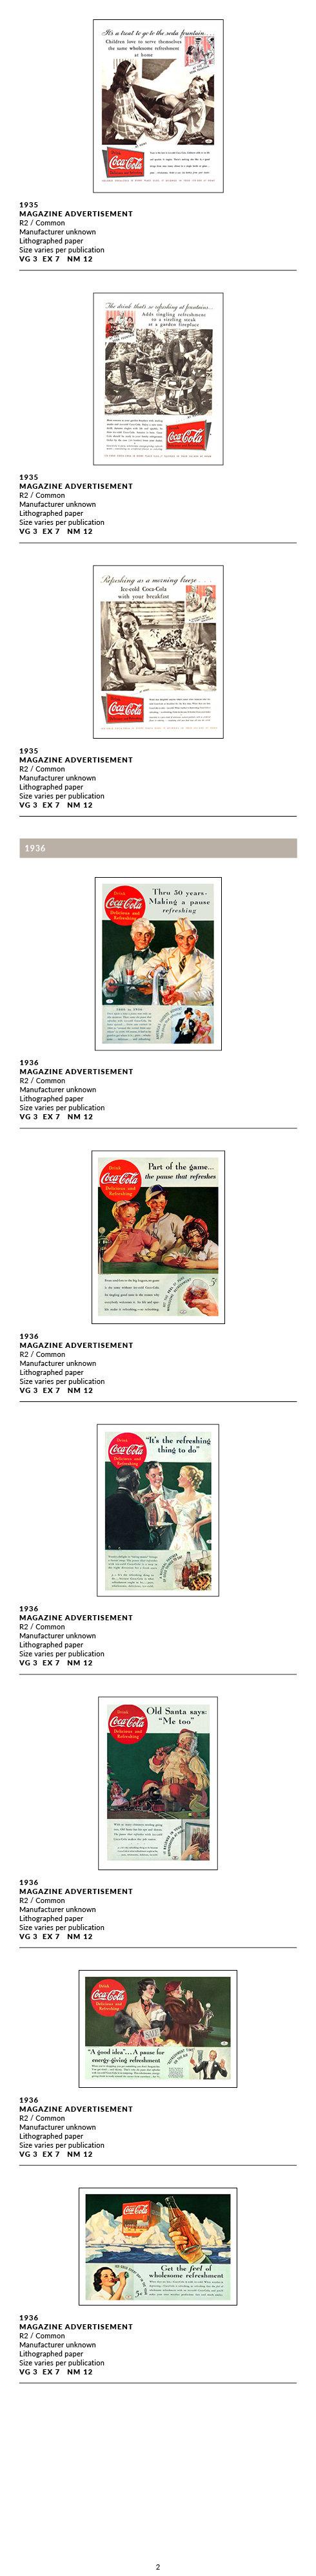 1935-39 Ads2.jpg